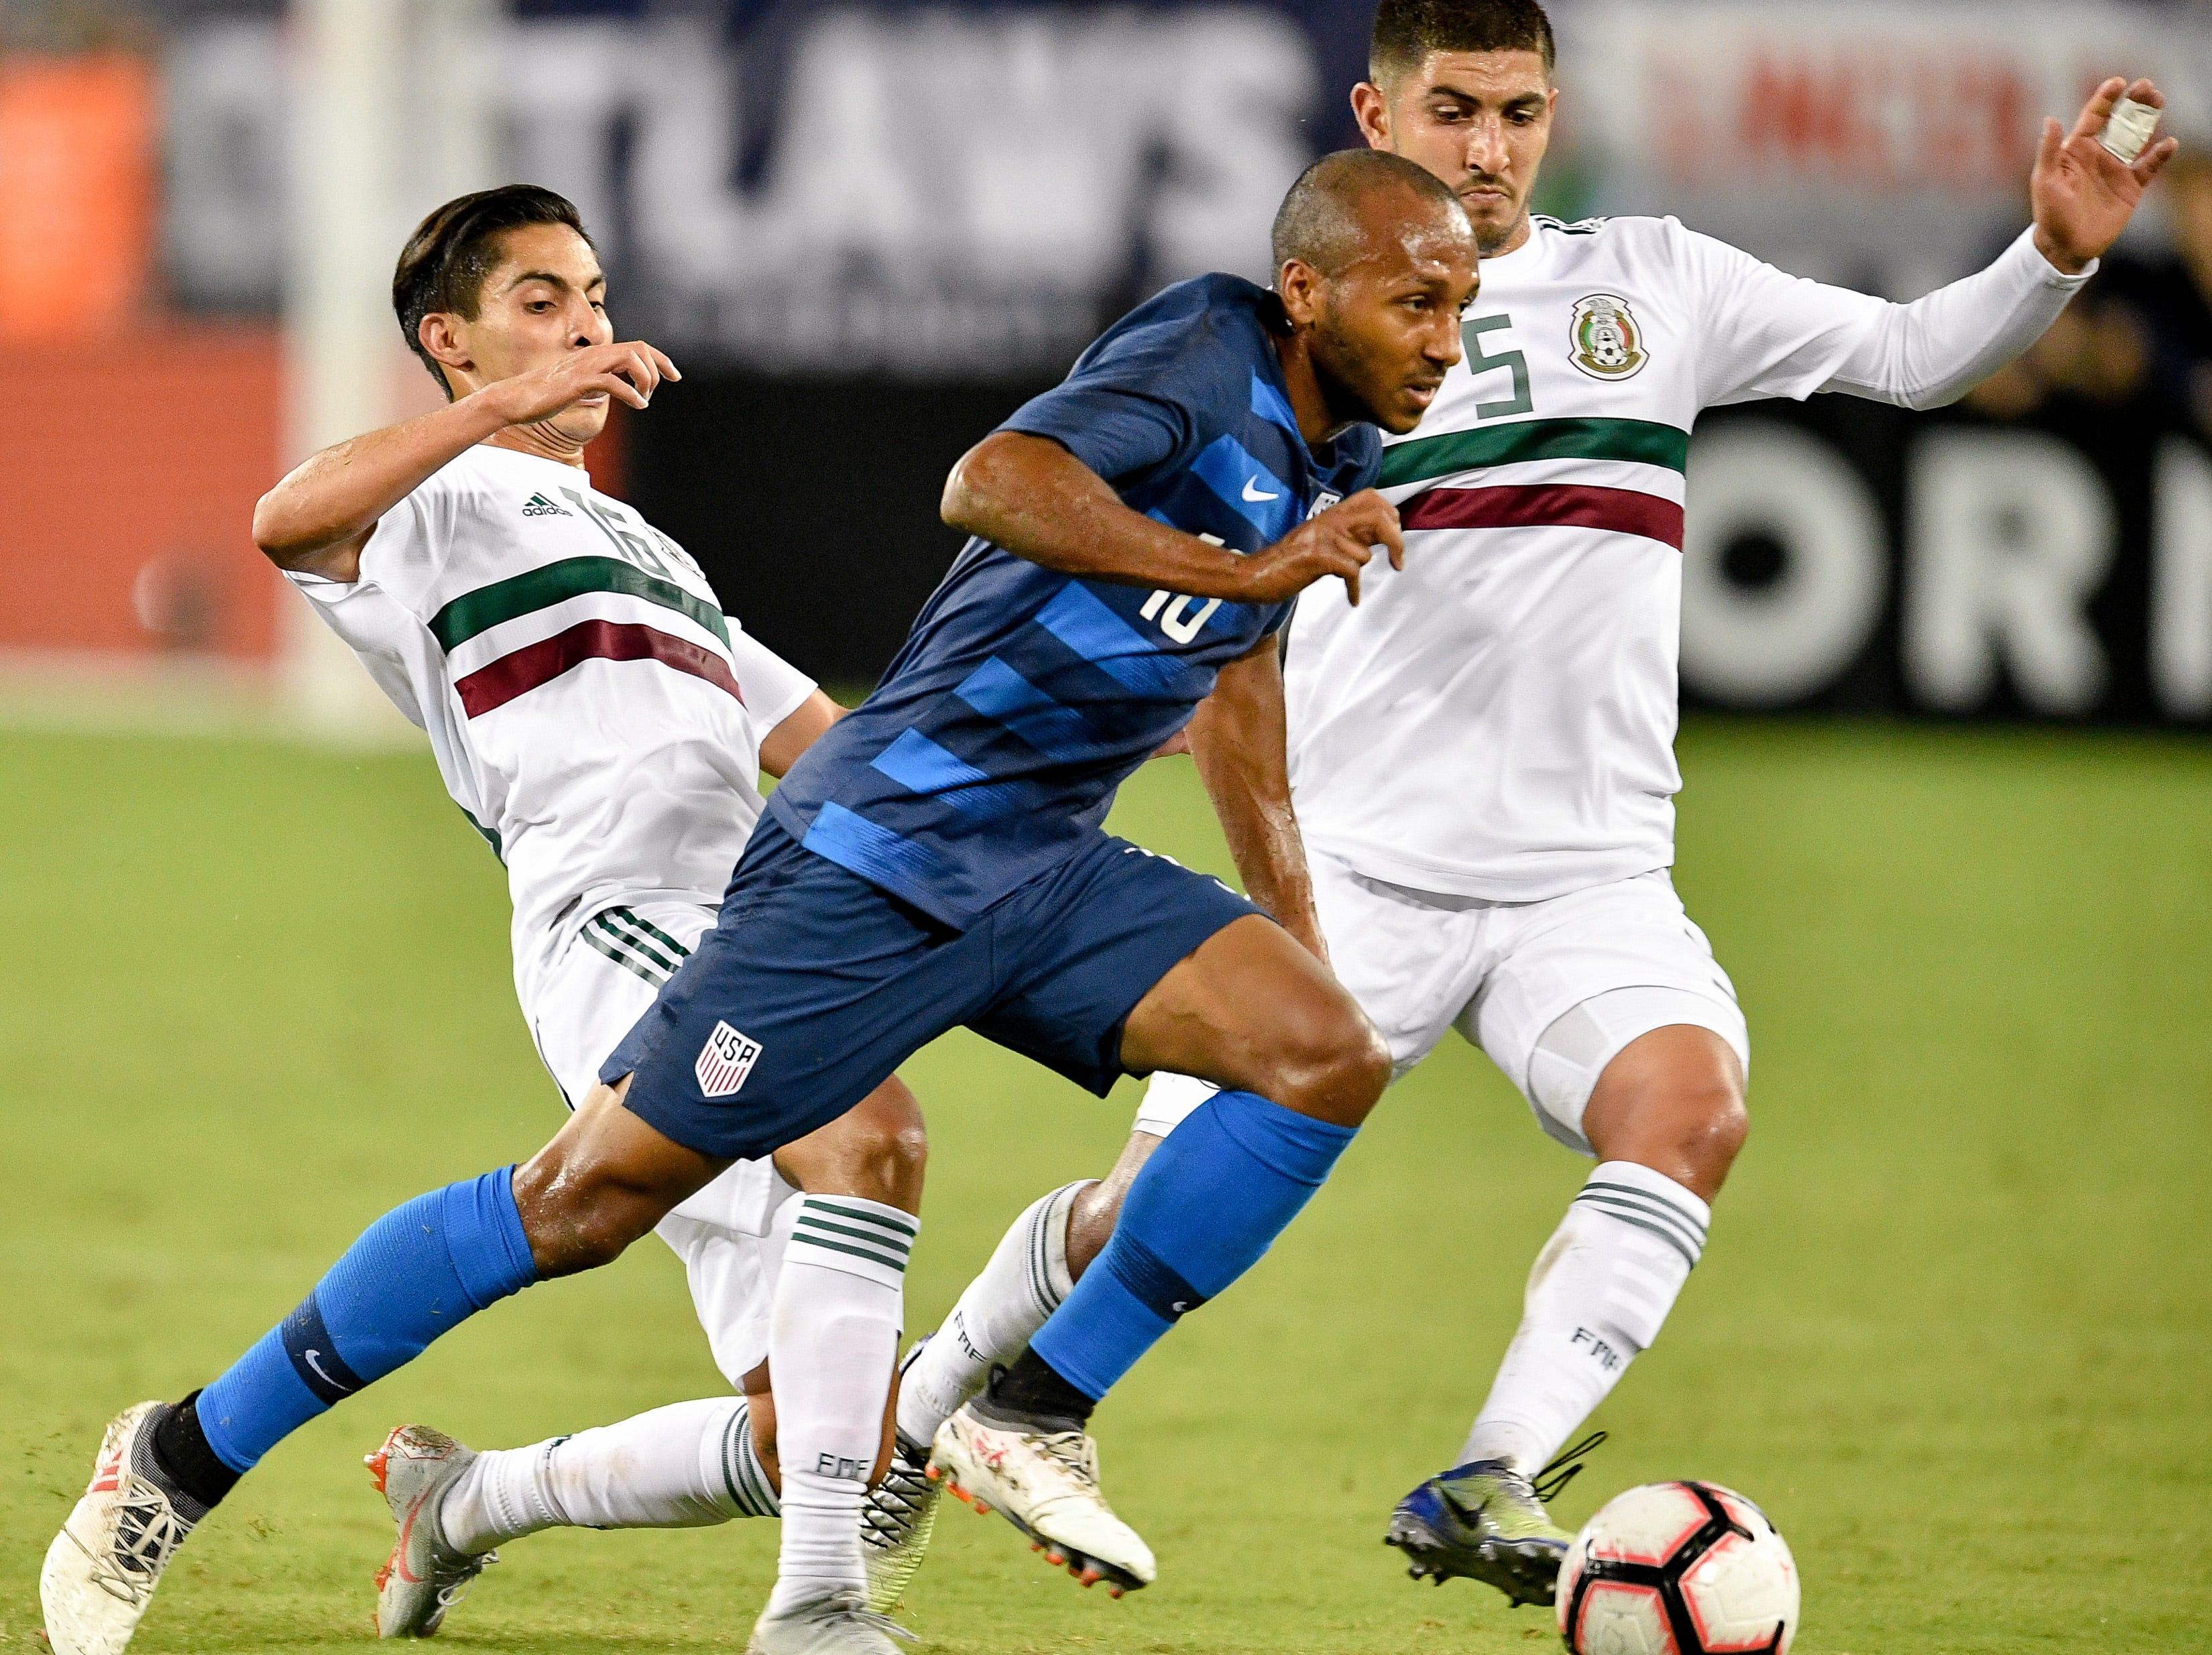 USA midfielder Julian Green (16) advances through Mexico midfielder Erick Aguirre (16) and midfielder Victor Guzman (5) during the second half at Nissan Stadium in Nashville, Tenn., Tuesday, Sept. 11, 2018.